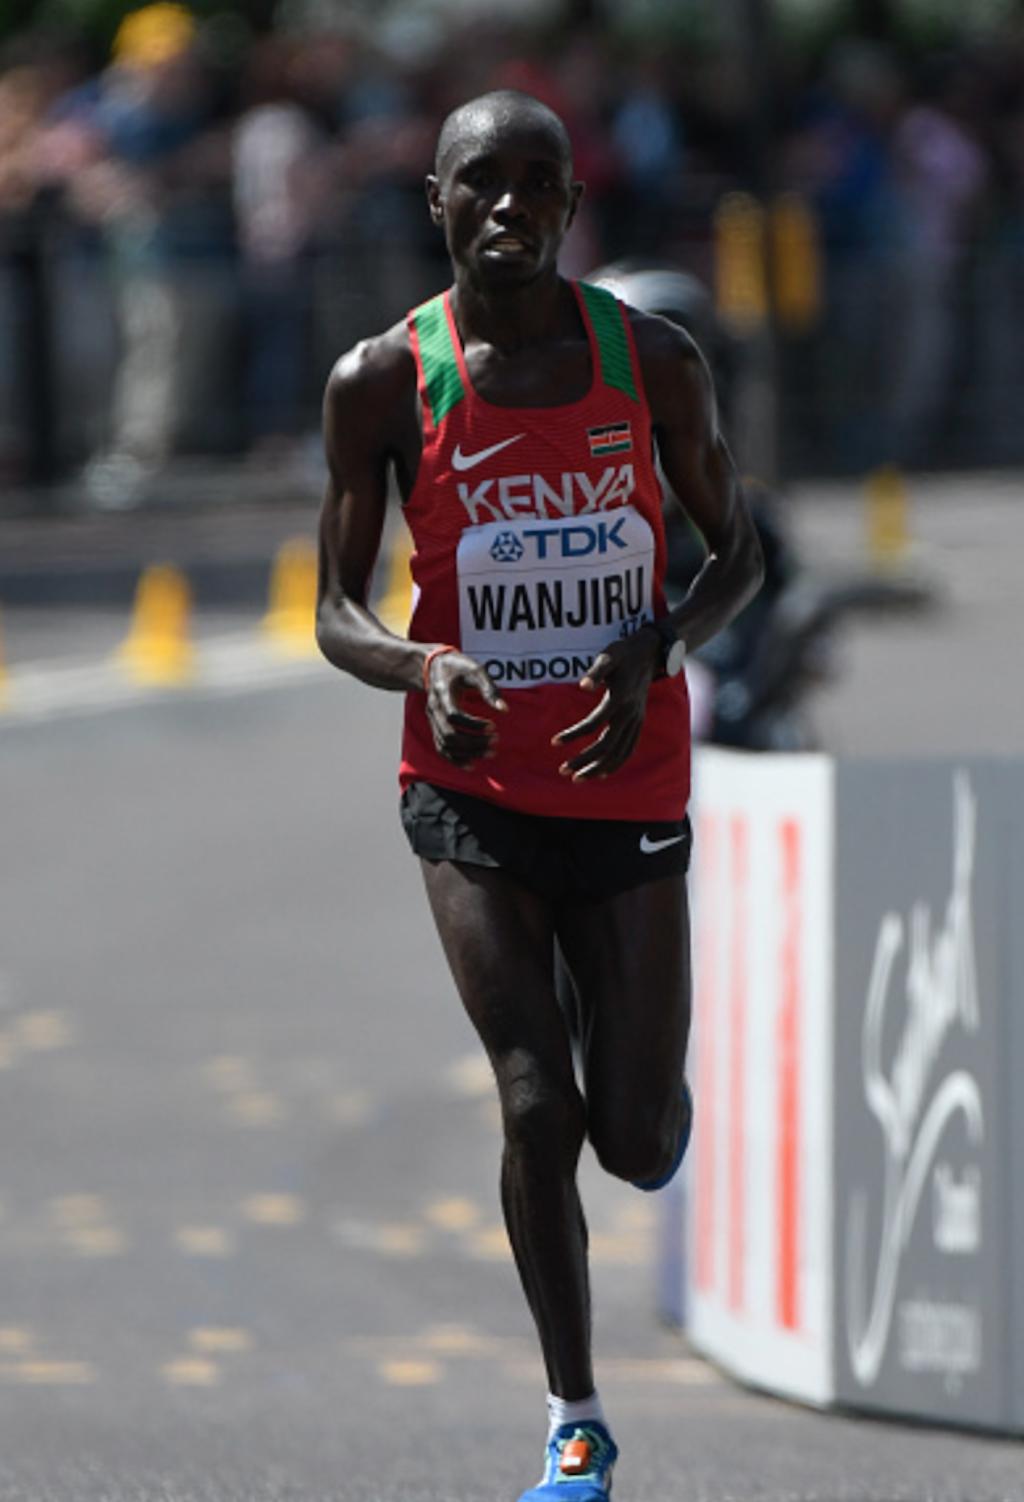 Daniel Kinyua Wanjiru